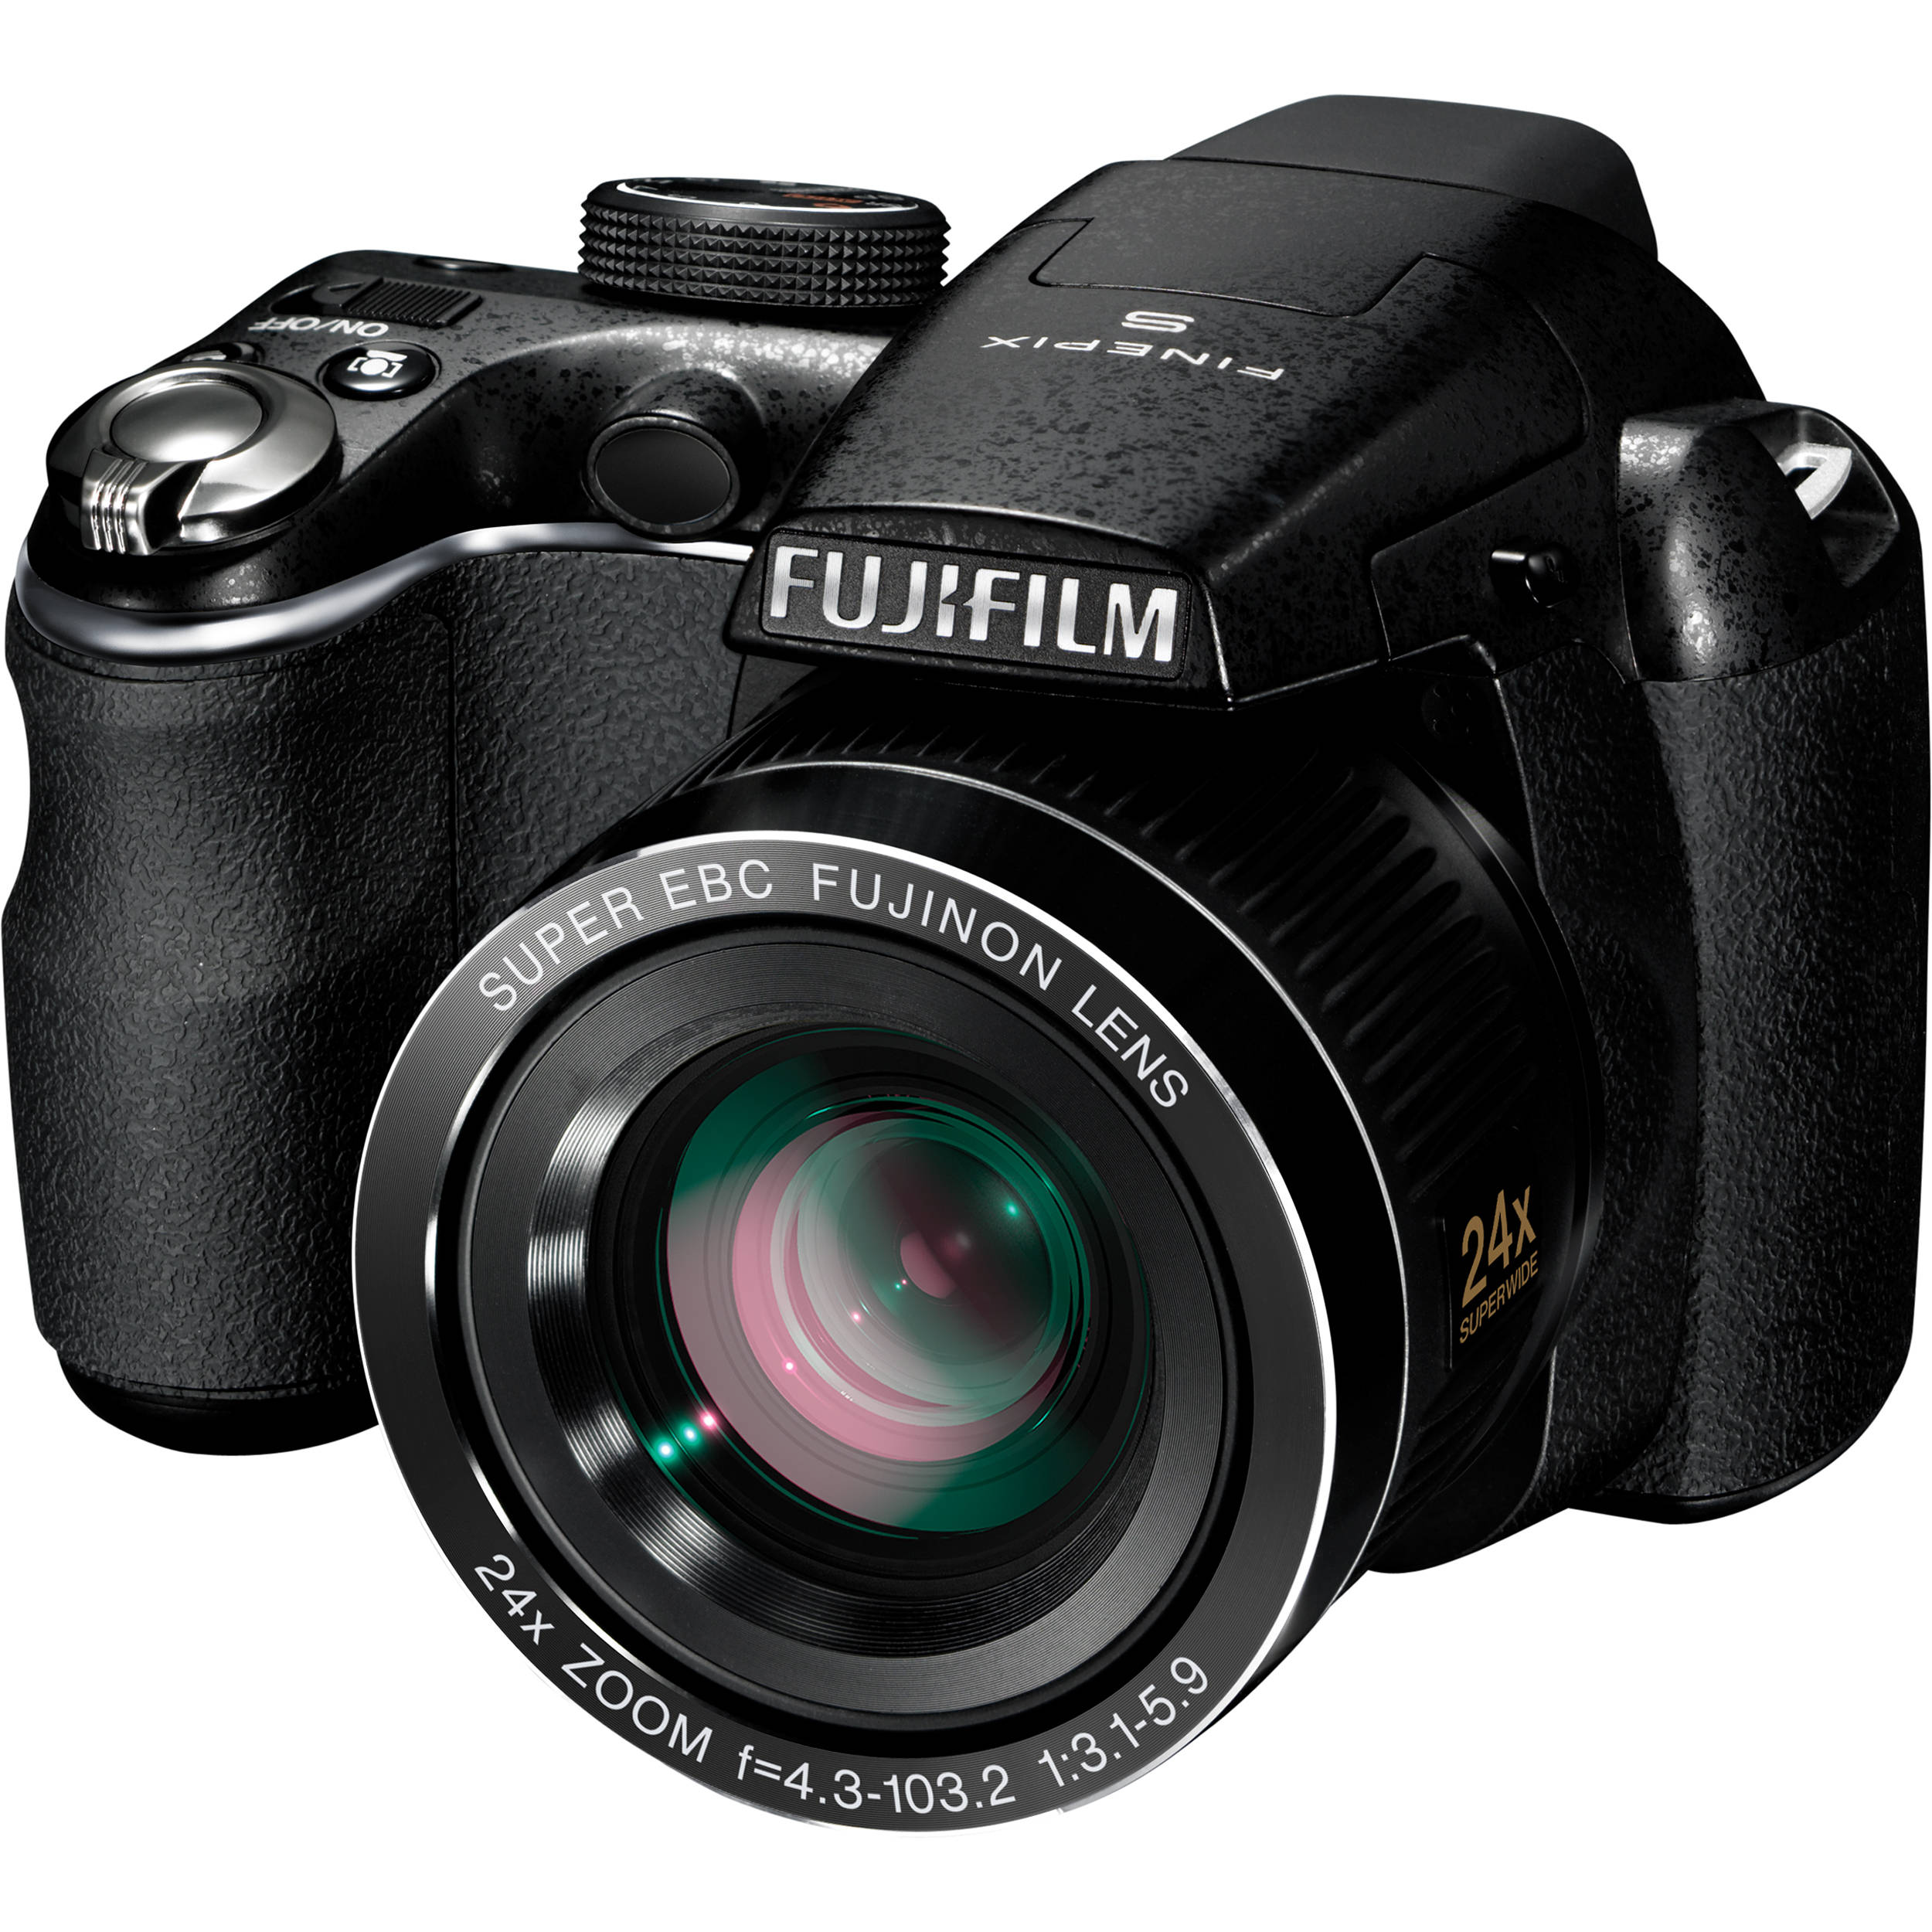 Fujifilm finepix-s3200-manual.